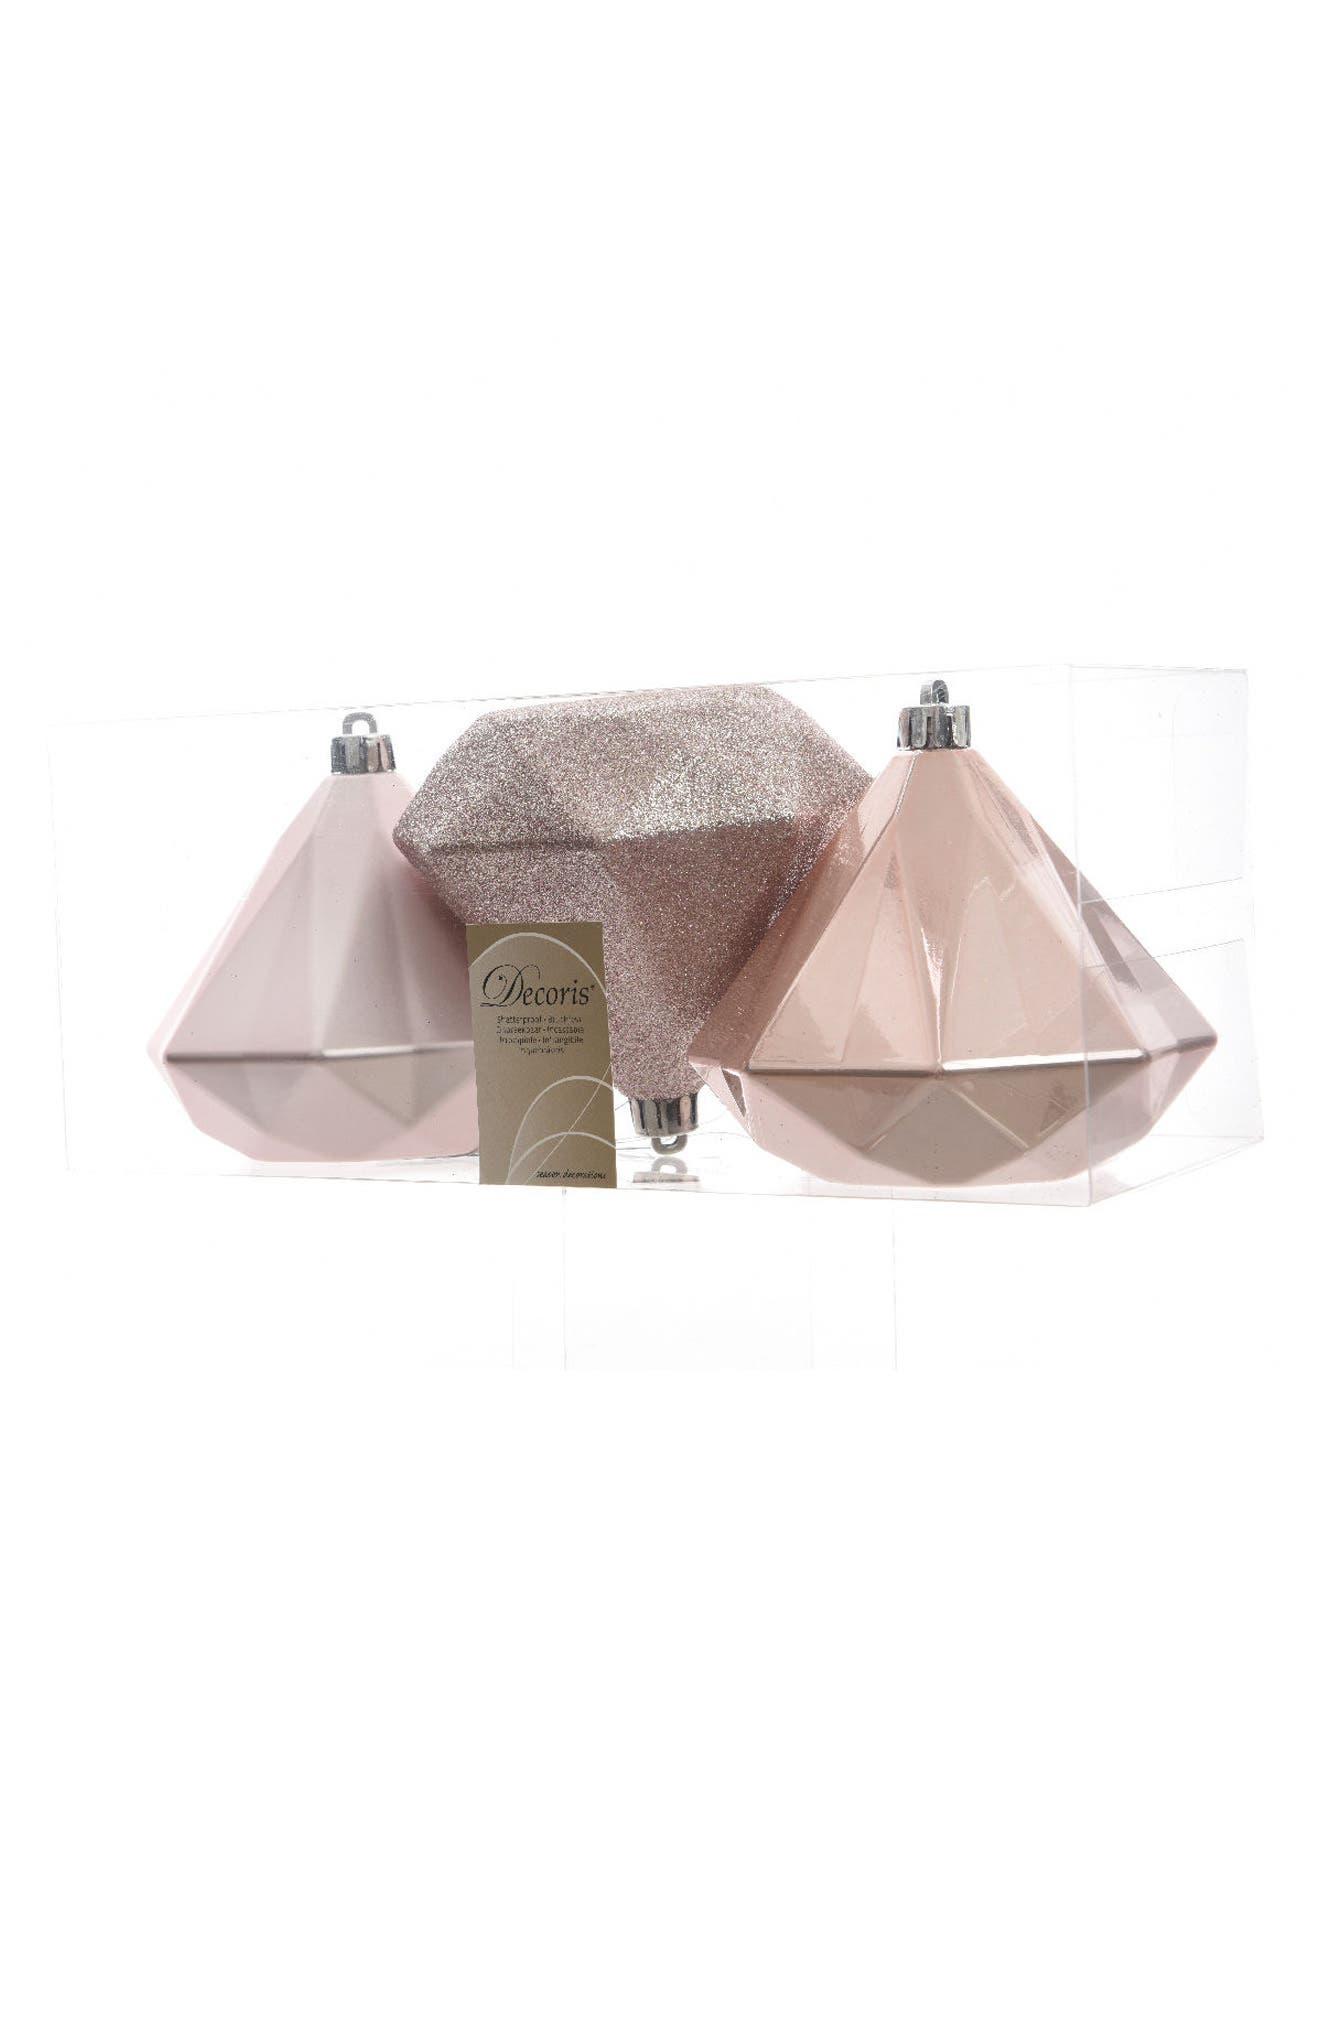 Decoris Set of 3 Giant Diamond Ornaments